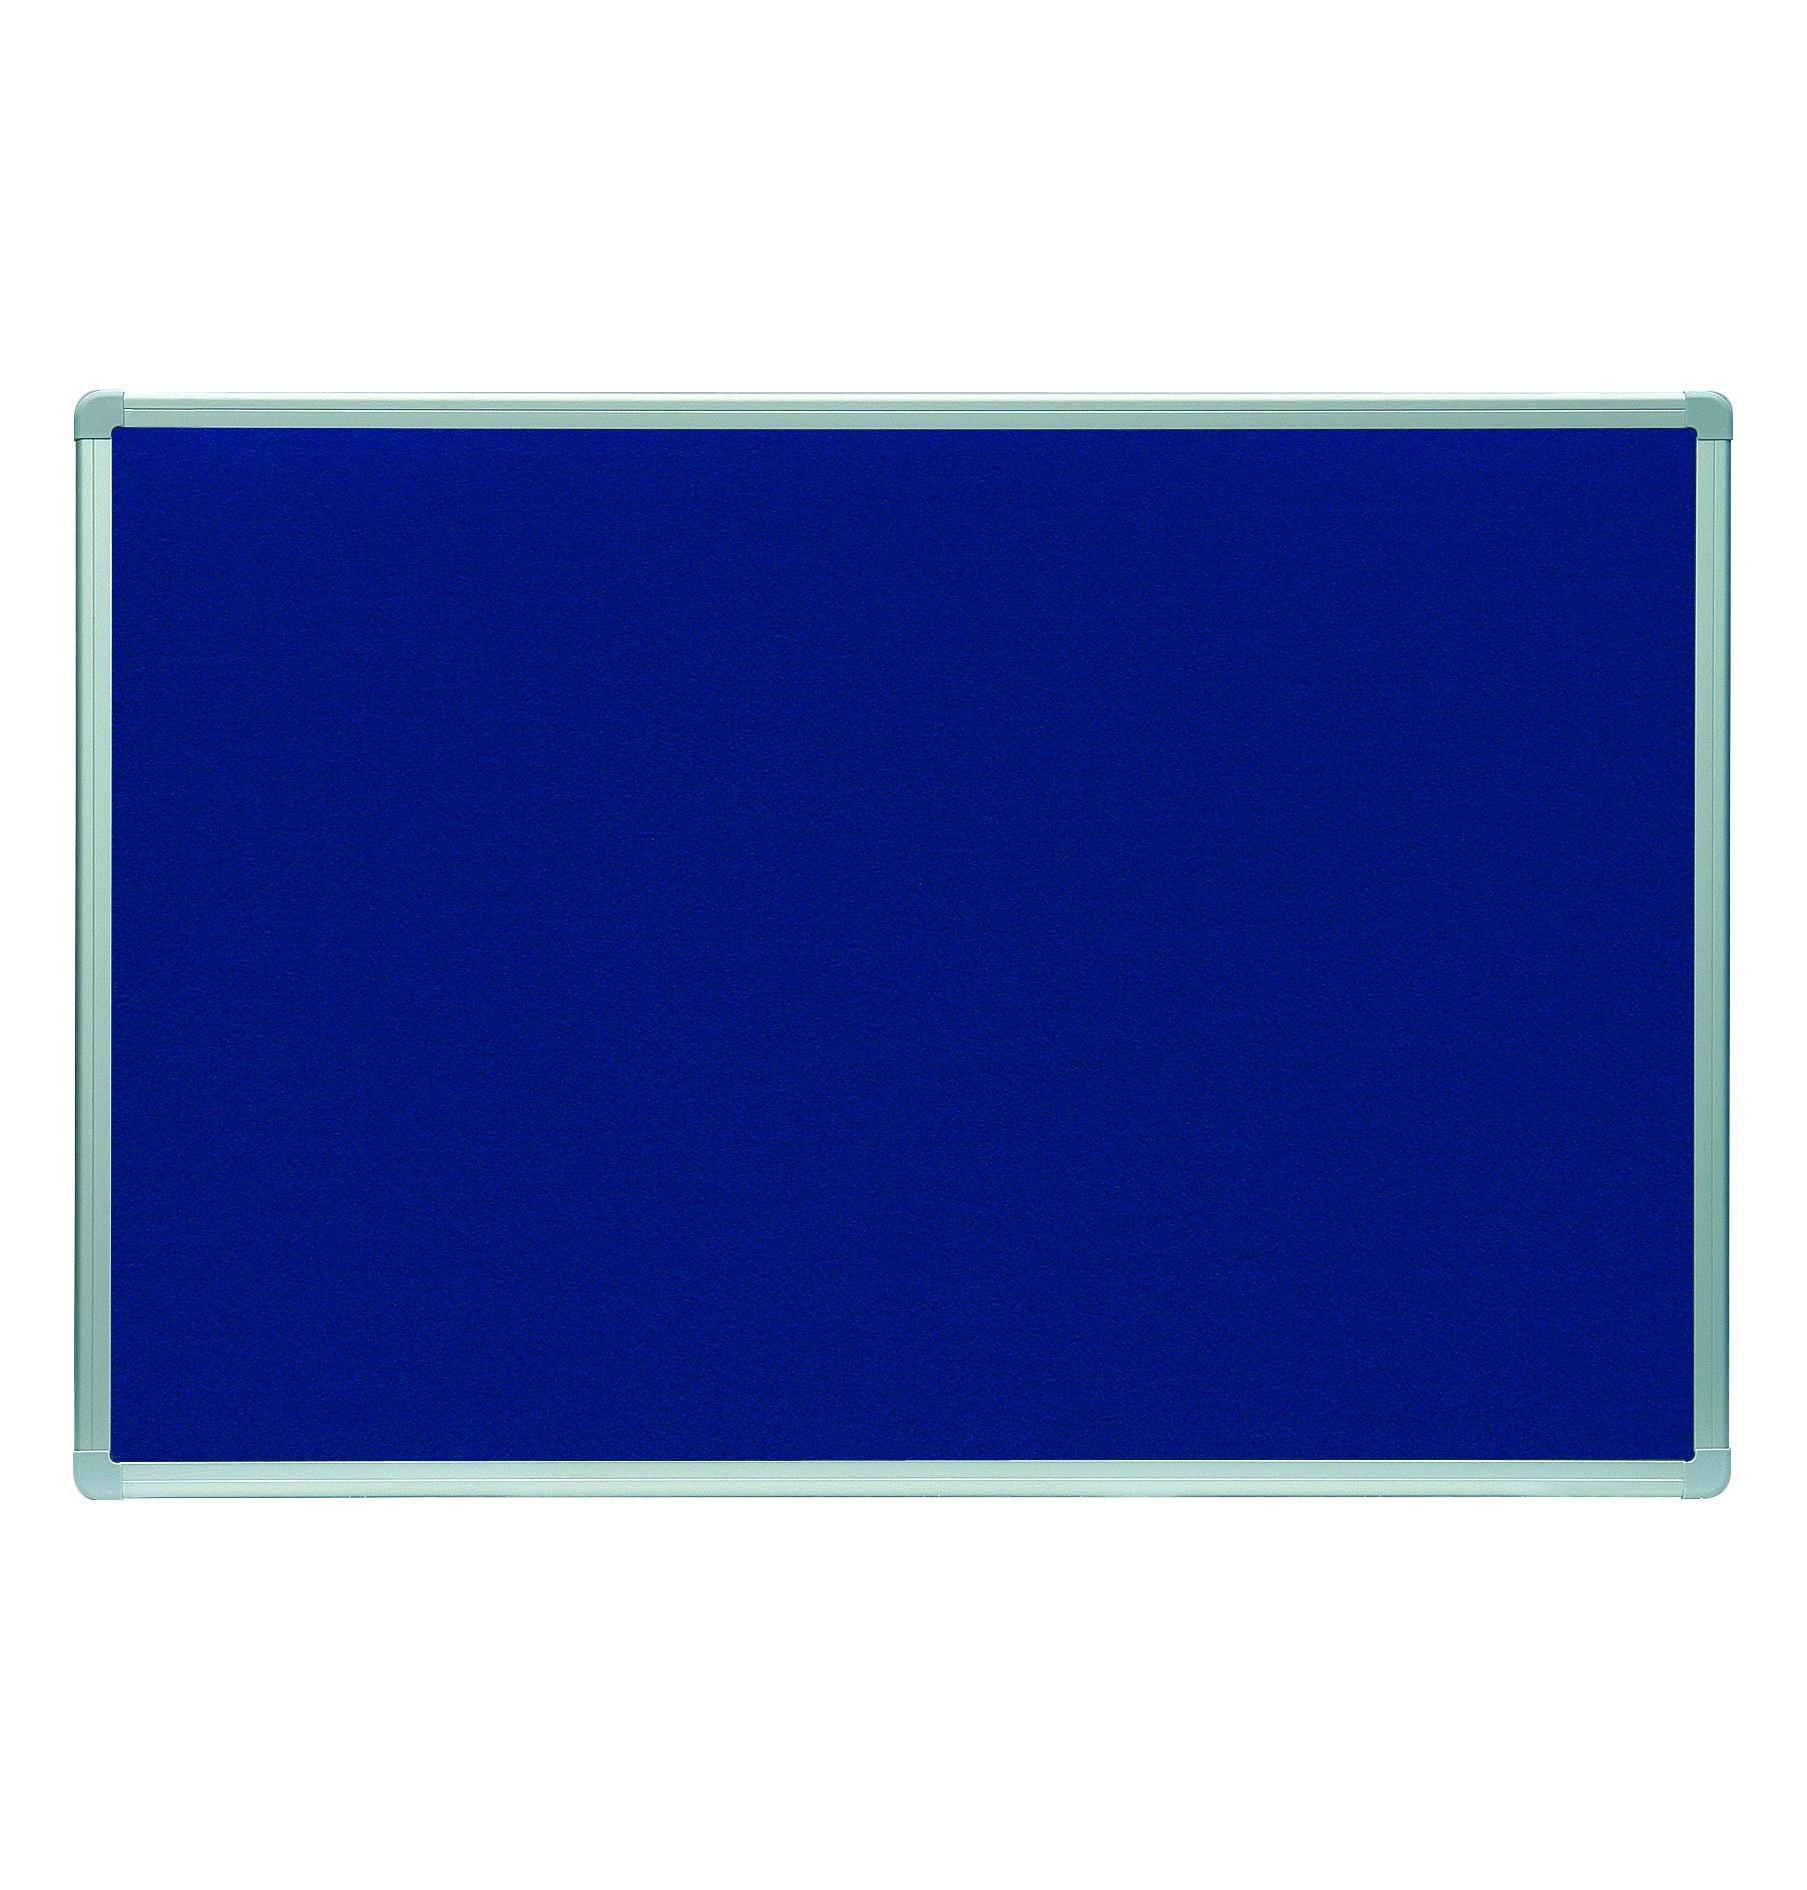 SLATE CARPET BLUE 45x60cm PROFILE ALUMINUM